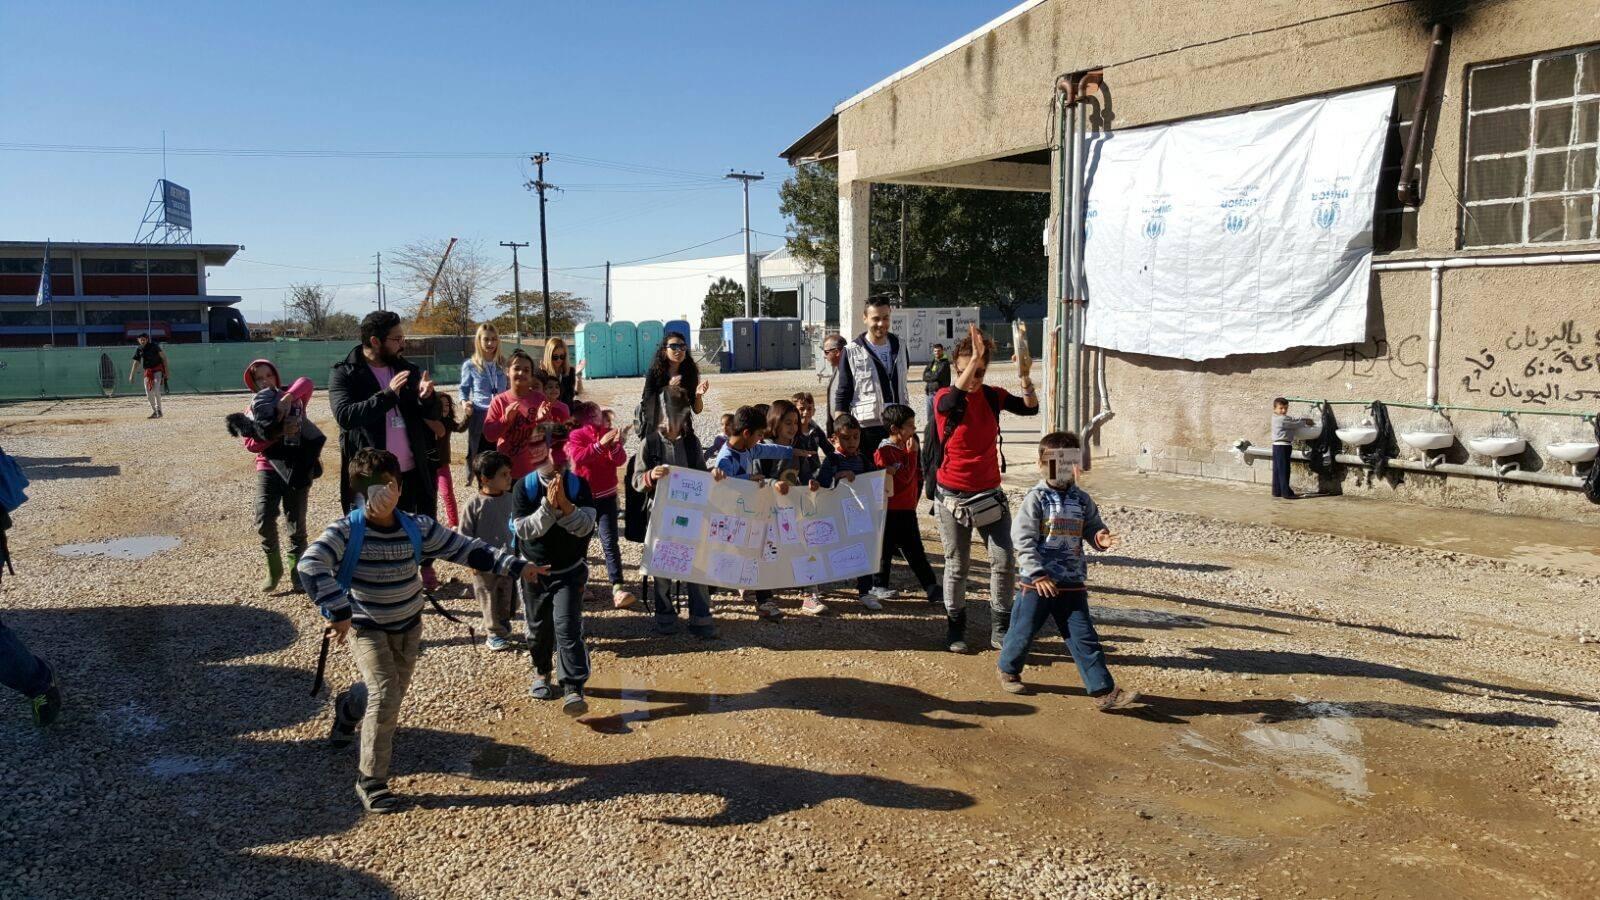 Intervolve: Mια οργάνωση για τους πρόσφυγες που δεν προσφέρει μόνο ρούχα